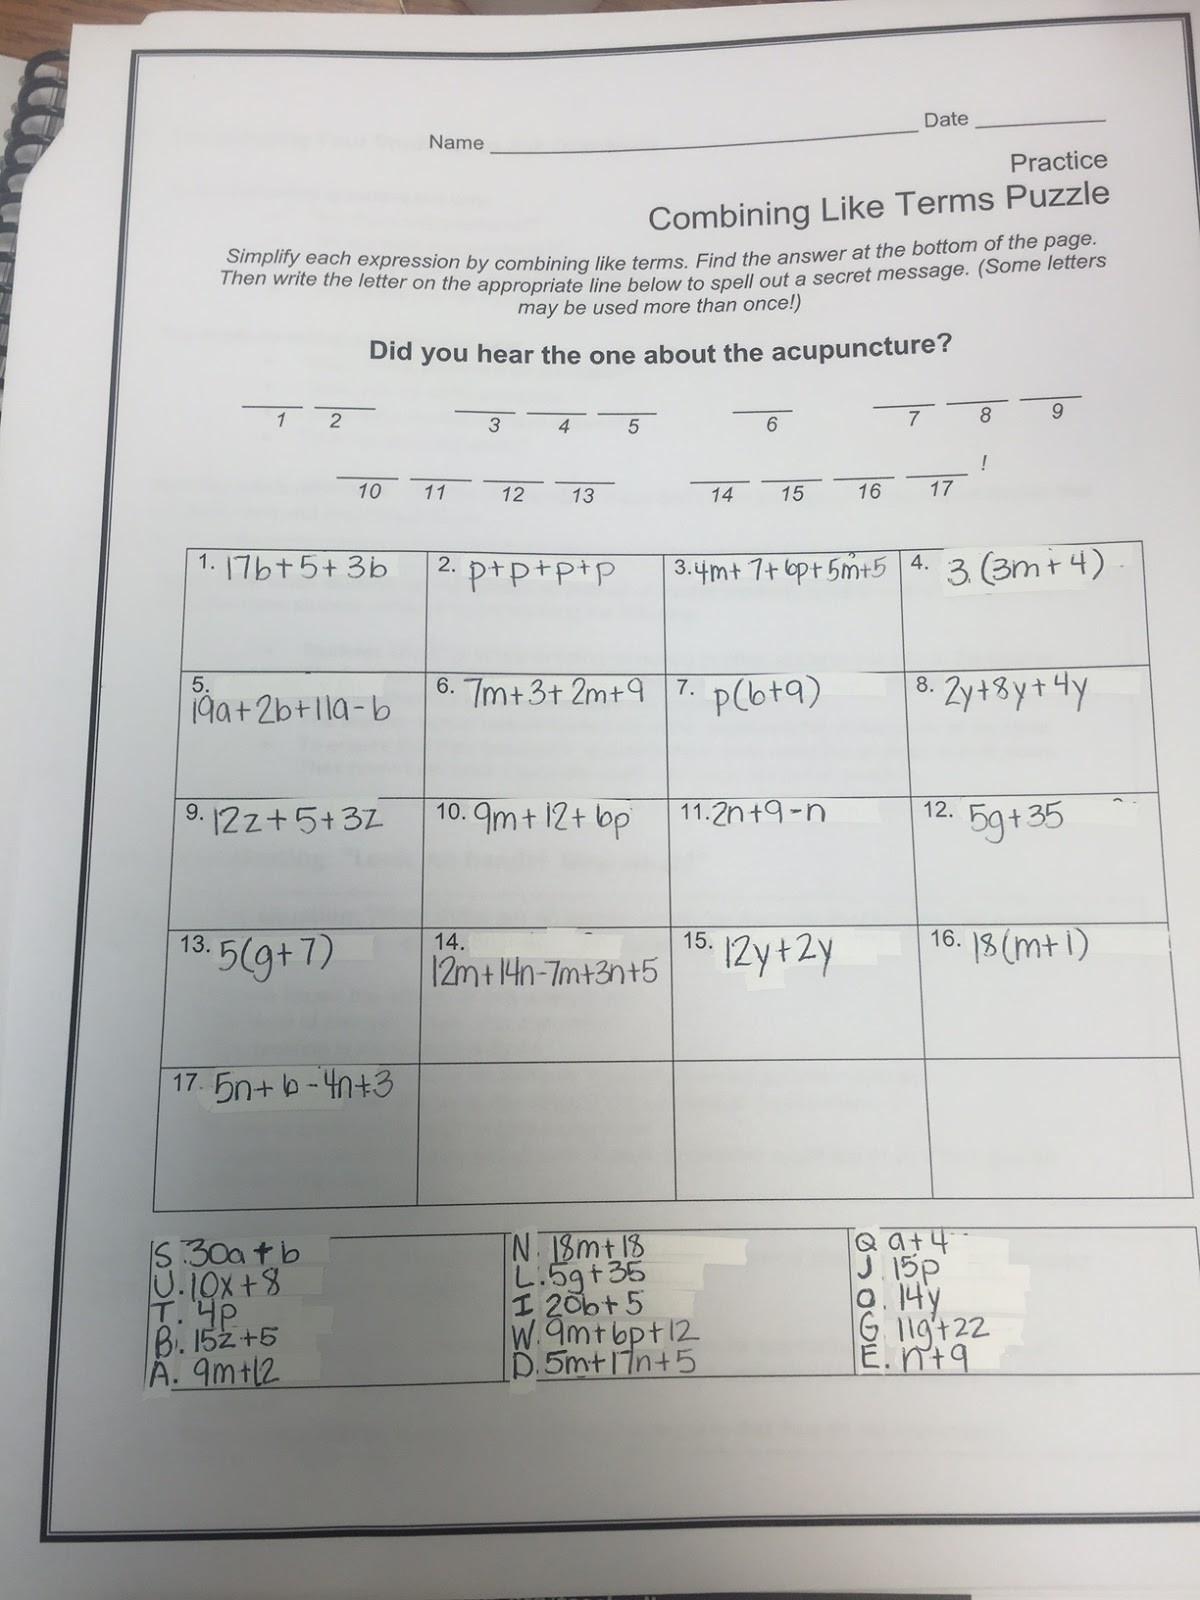 Combining Like Terms Practice Worksheet Bining Like Terms Addition Worksheet